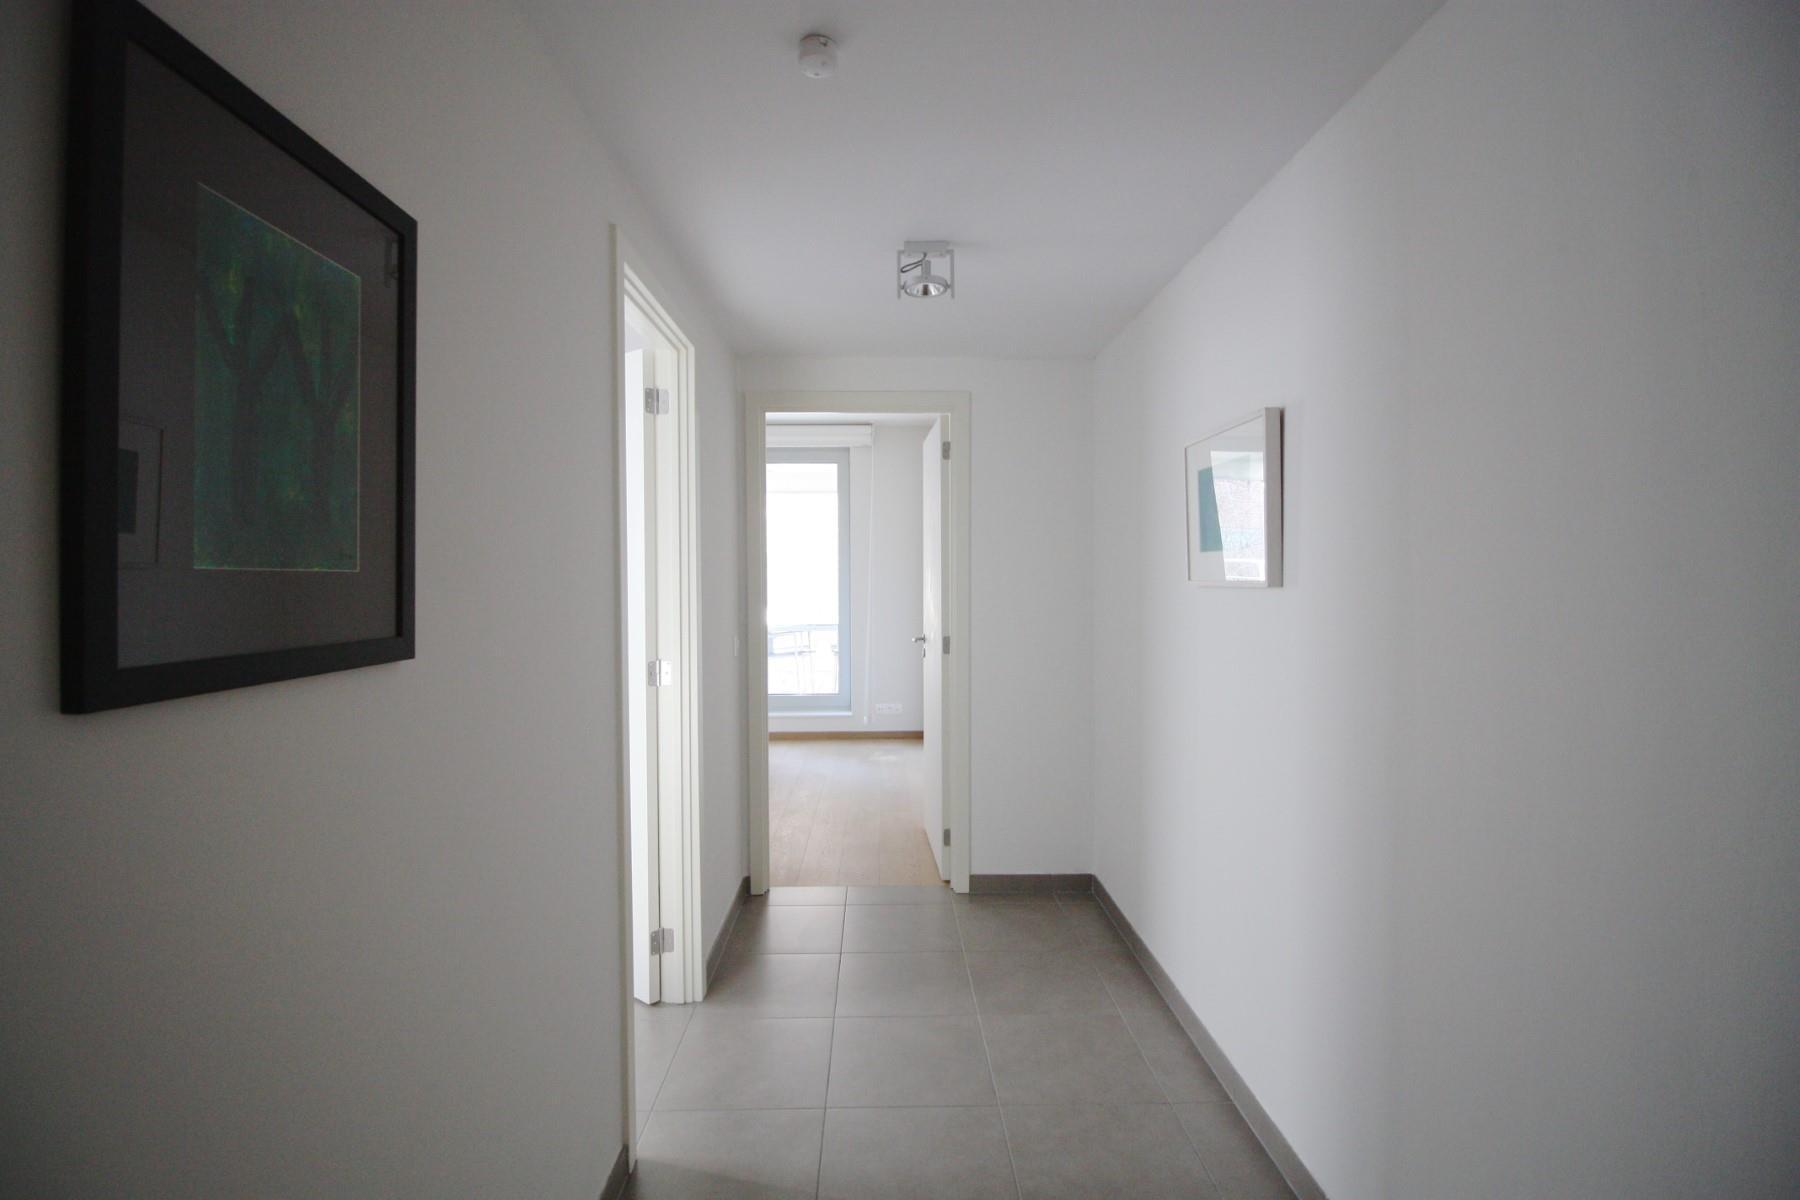 Flat - Etterbeek - #4527457-17